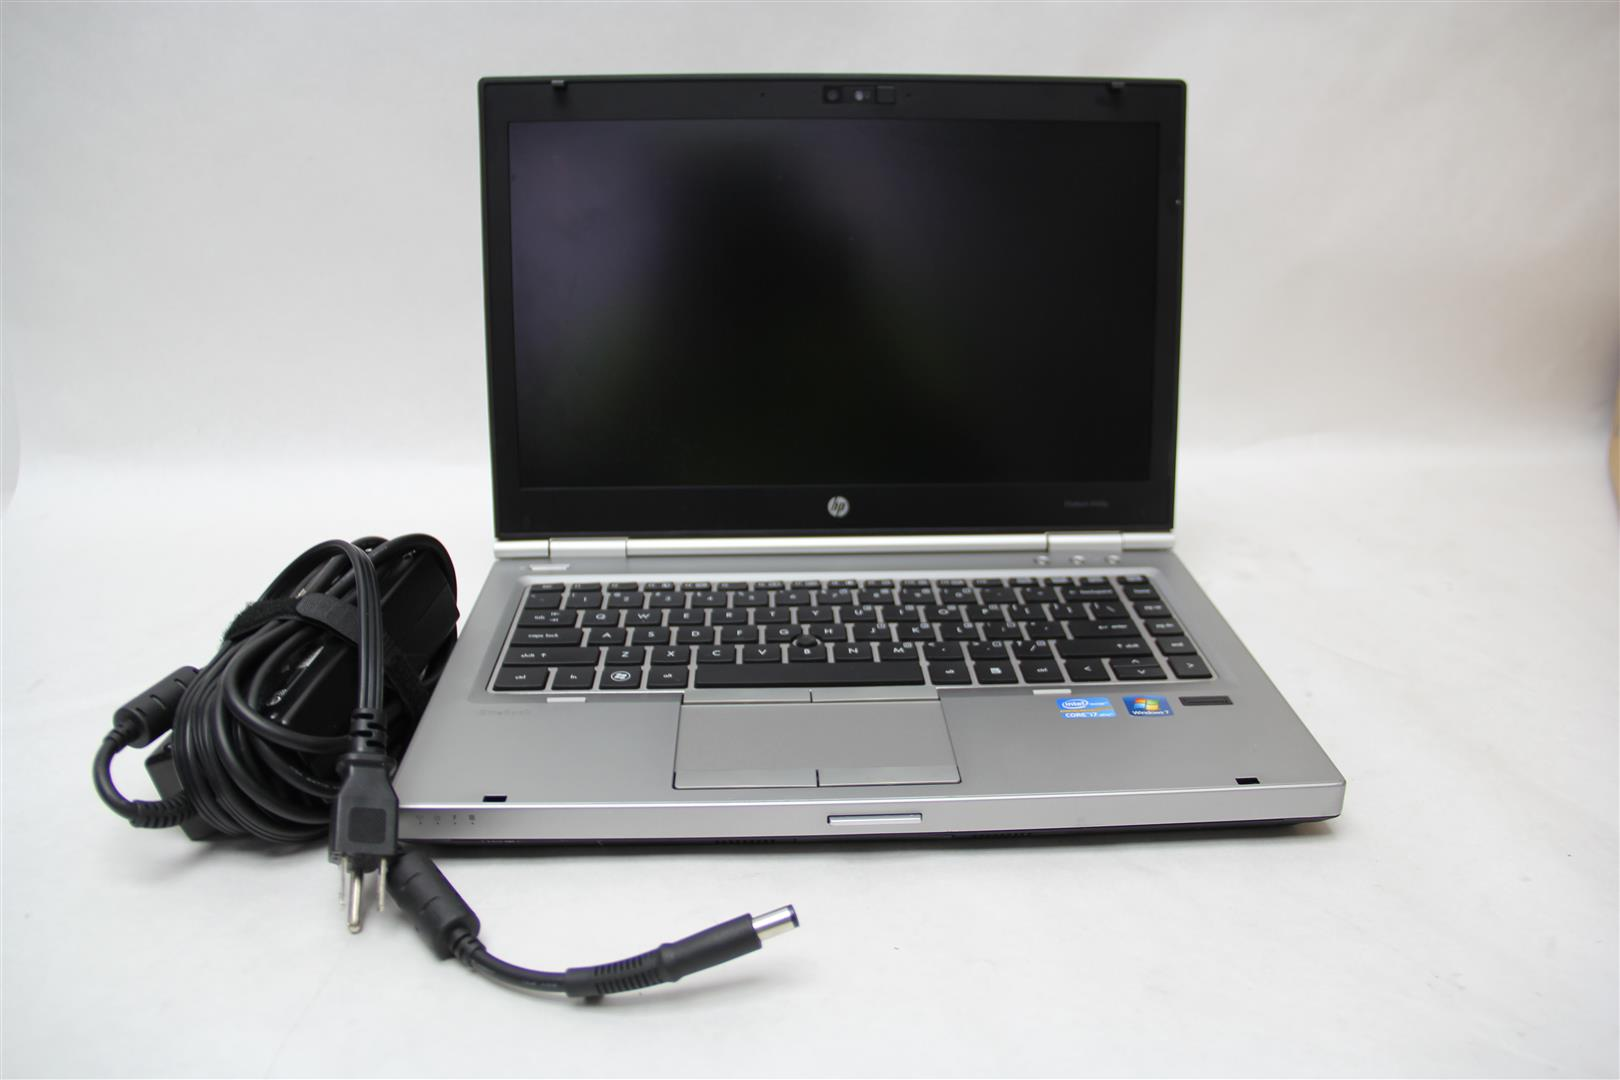 HP Elitebook 8460p Business Class Laptop - YouTube